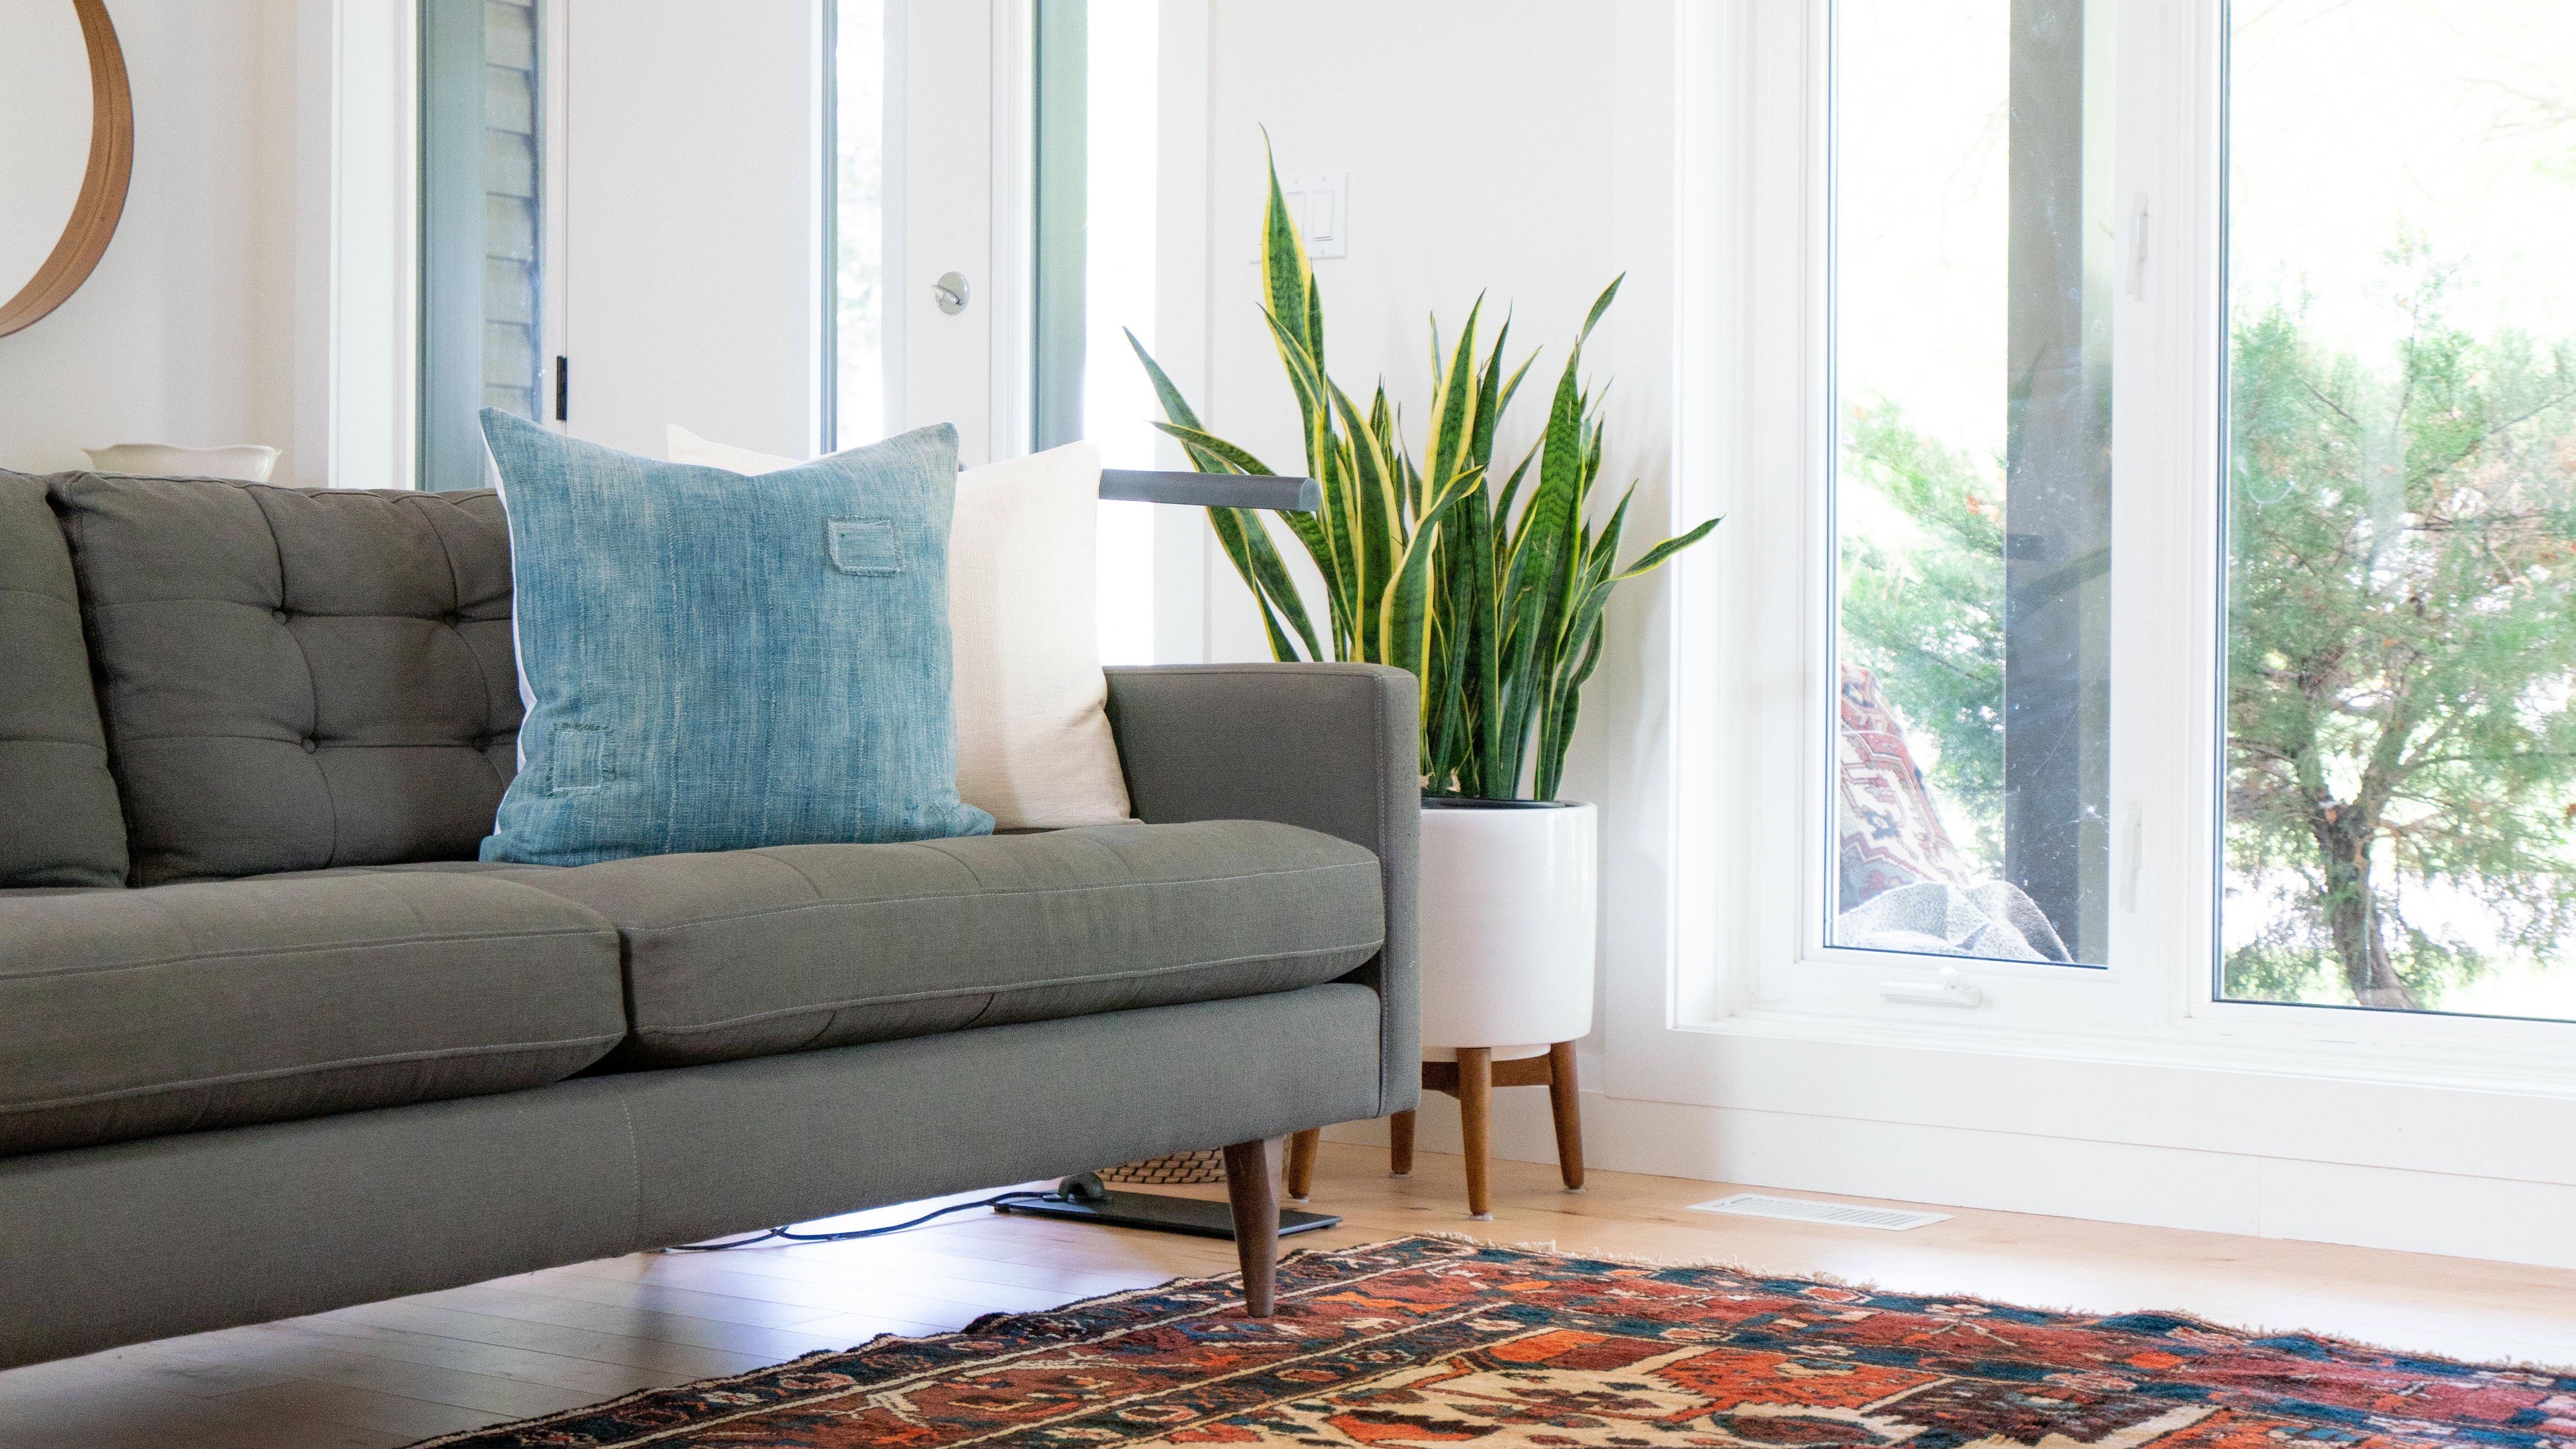 Modern Contemporary And Minimalist Bedroom Design